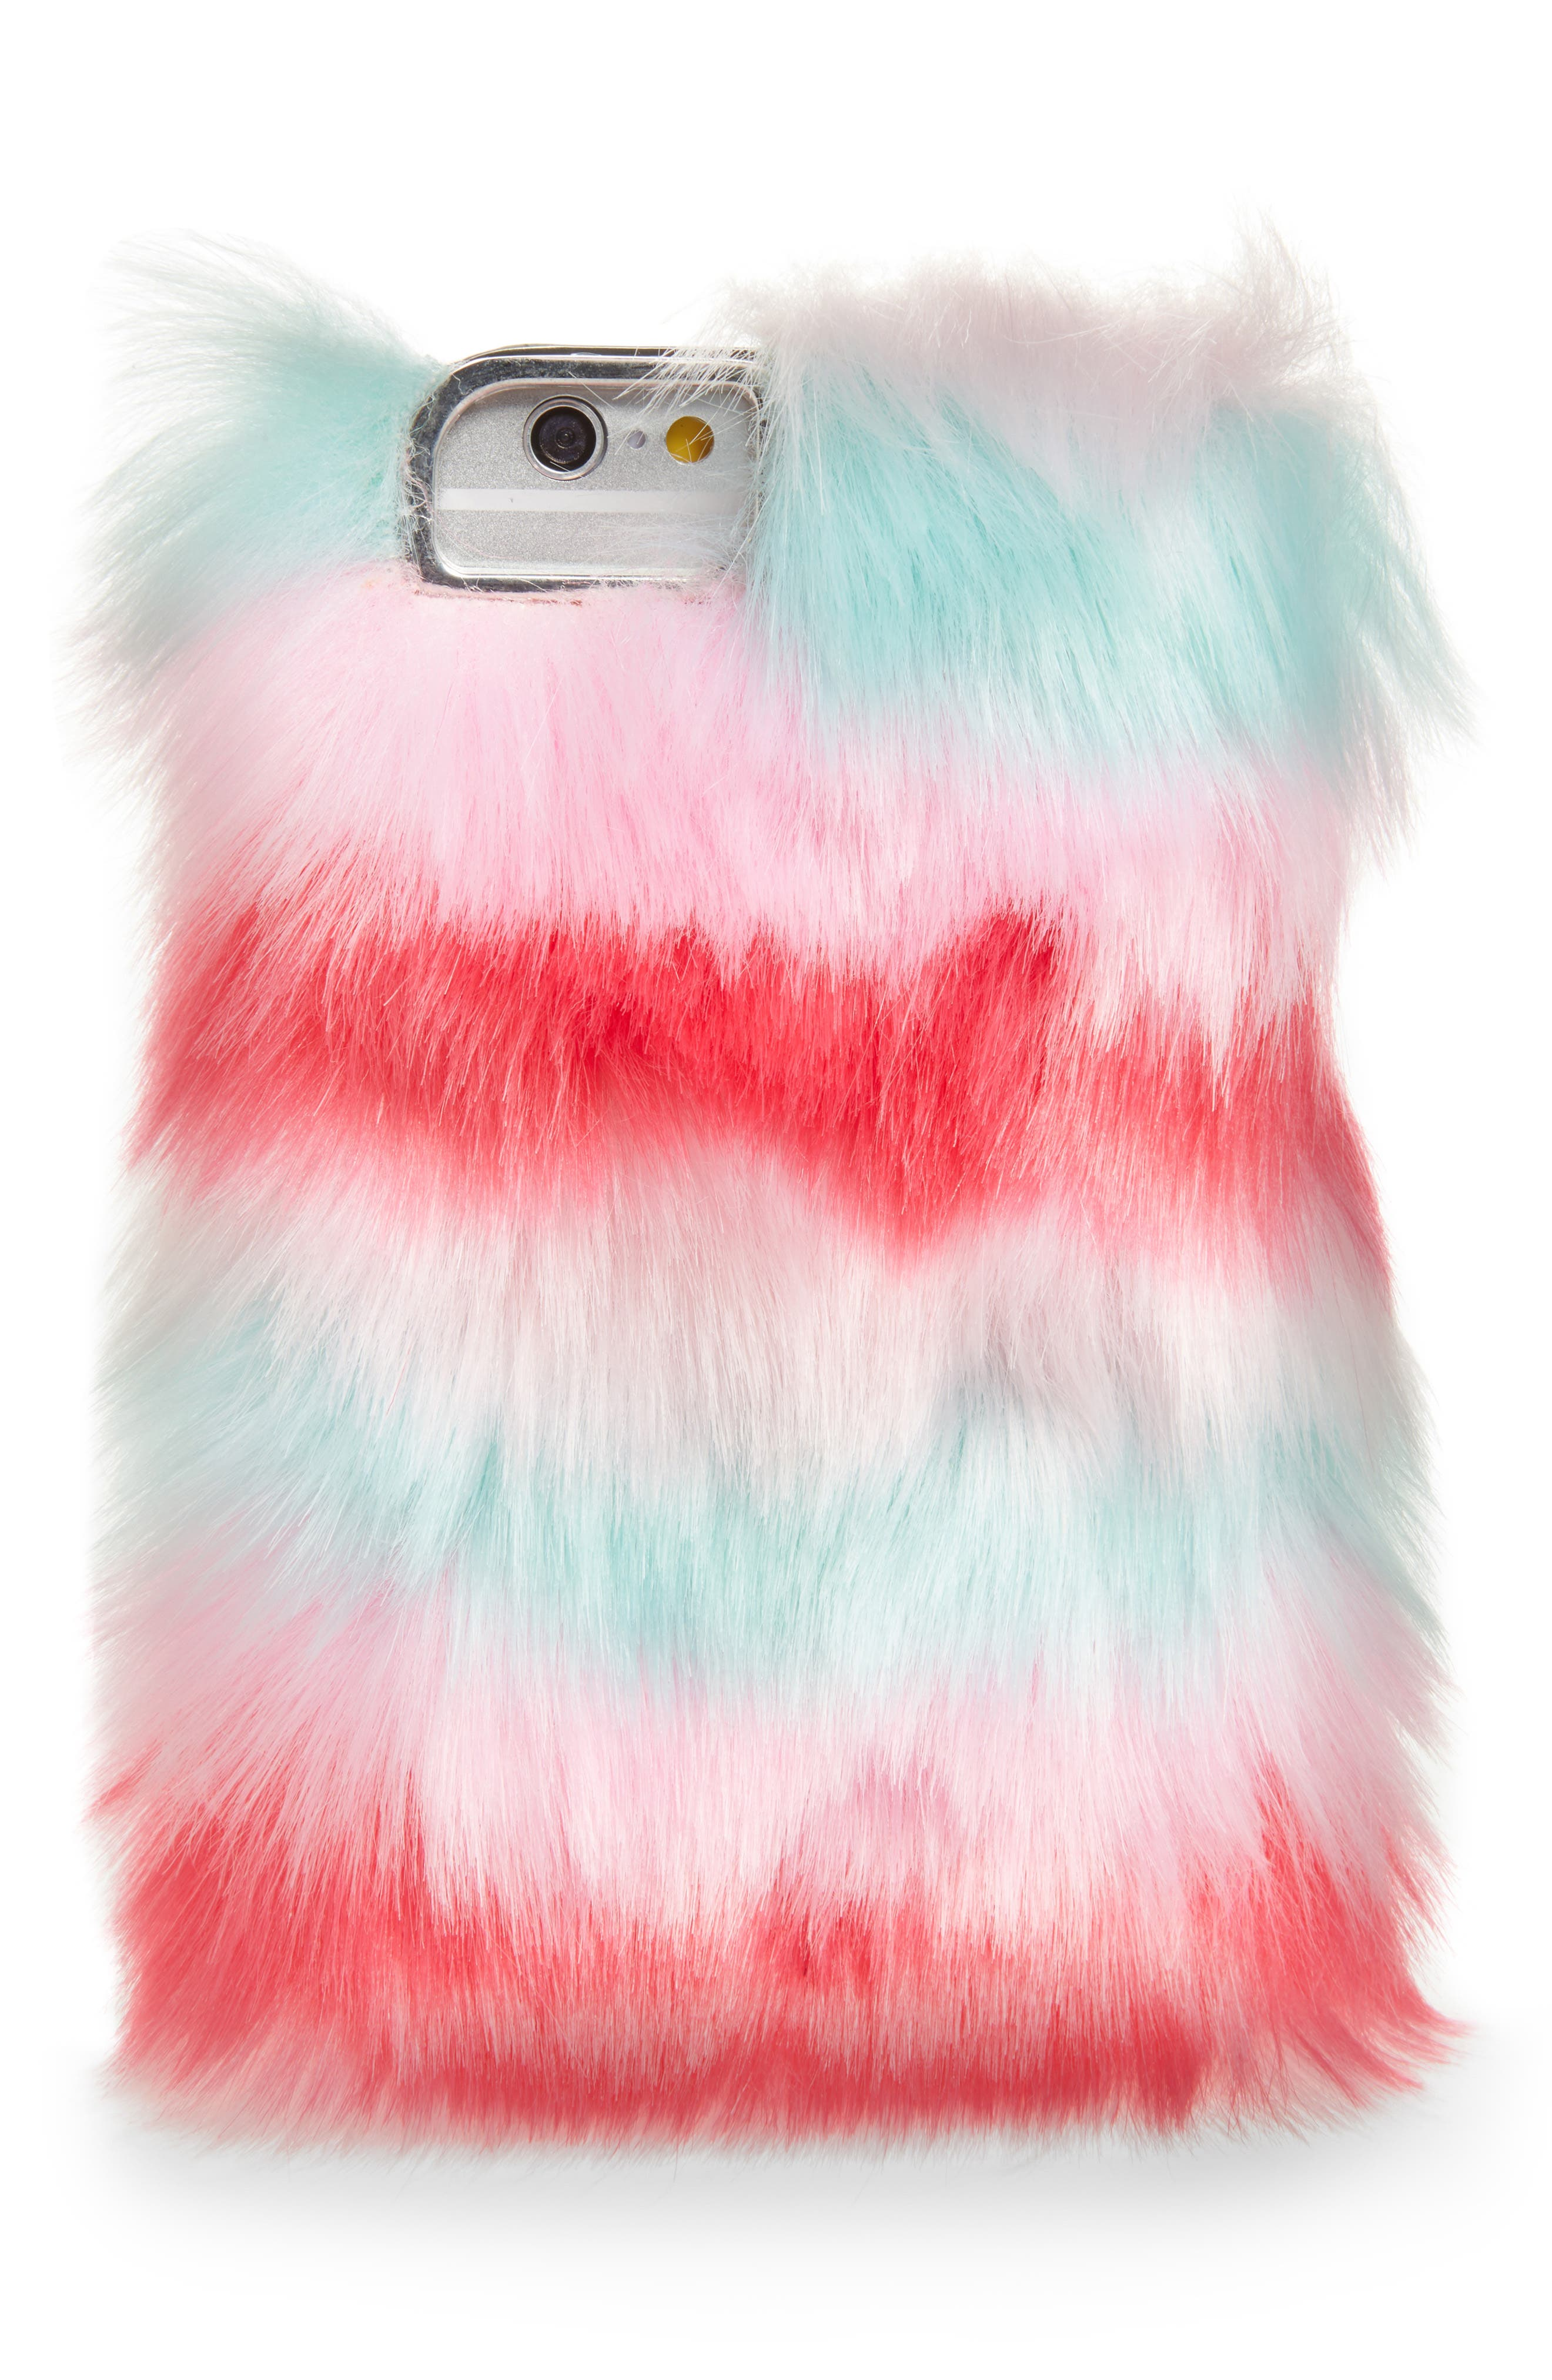 Main Image - Skinny Dip Prism iPhone 6/6s/7/8 & 6/6s/7/8 Plus Faux Fur Case